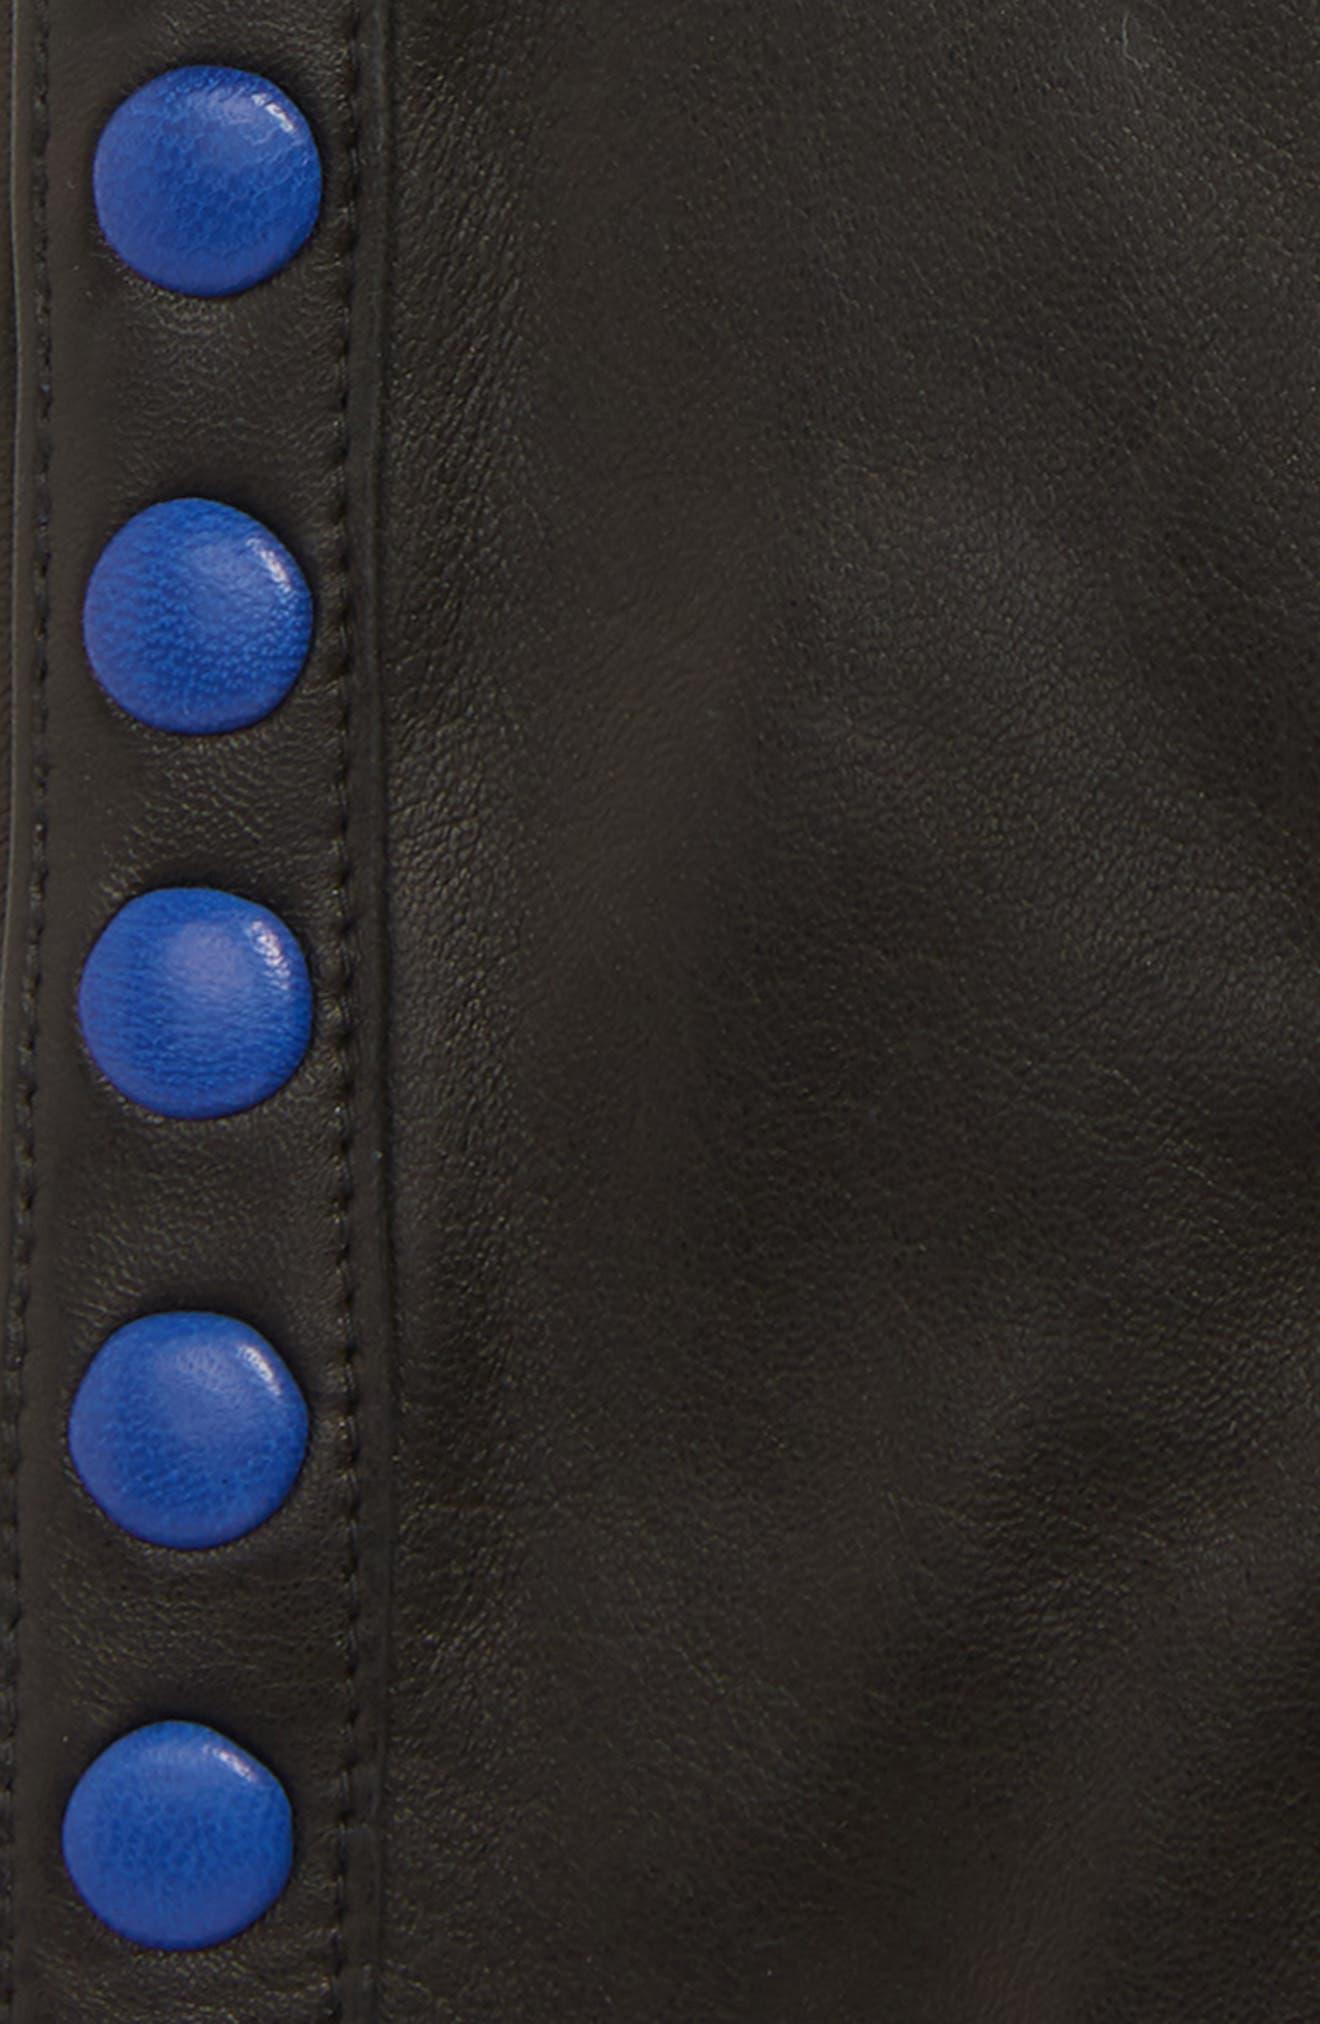 Color Pop Button Lambskin Leather Gloves,                             Alternate thumbnail 3, color,                             001